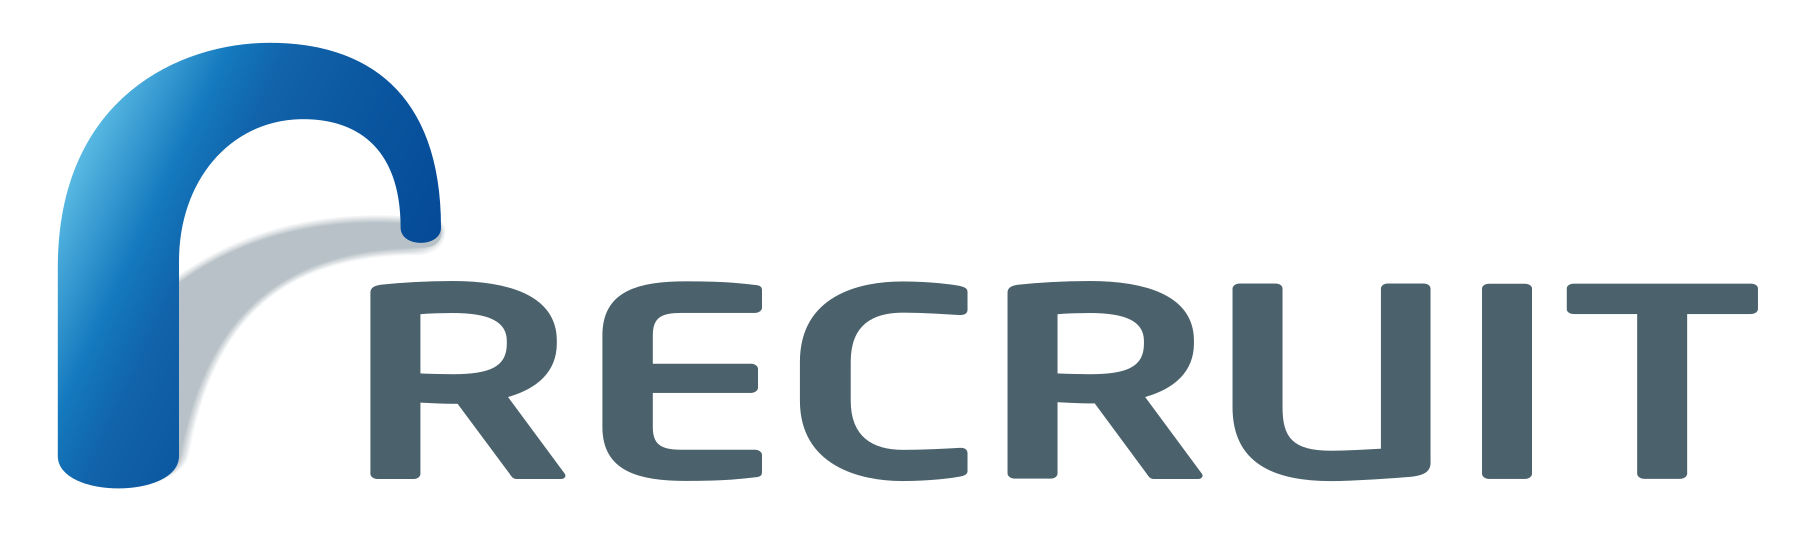 Recruit_Holdings_logo_crop.png